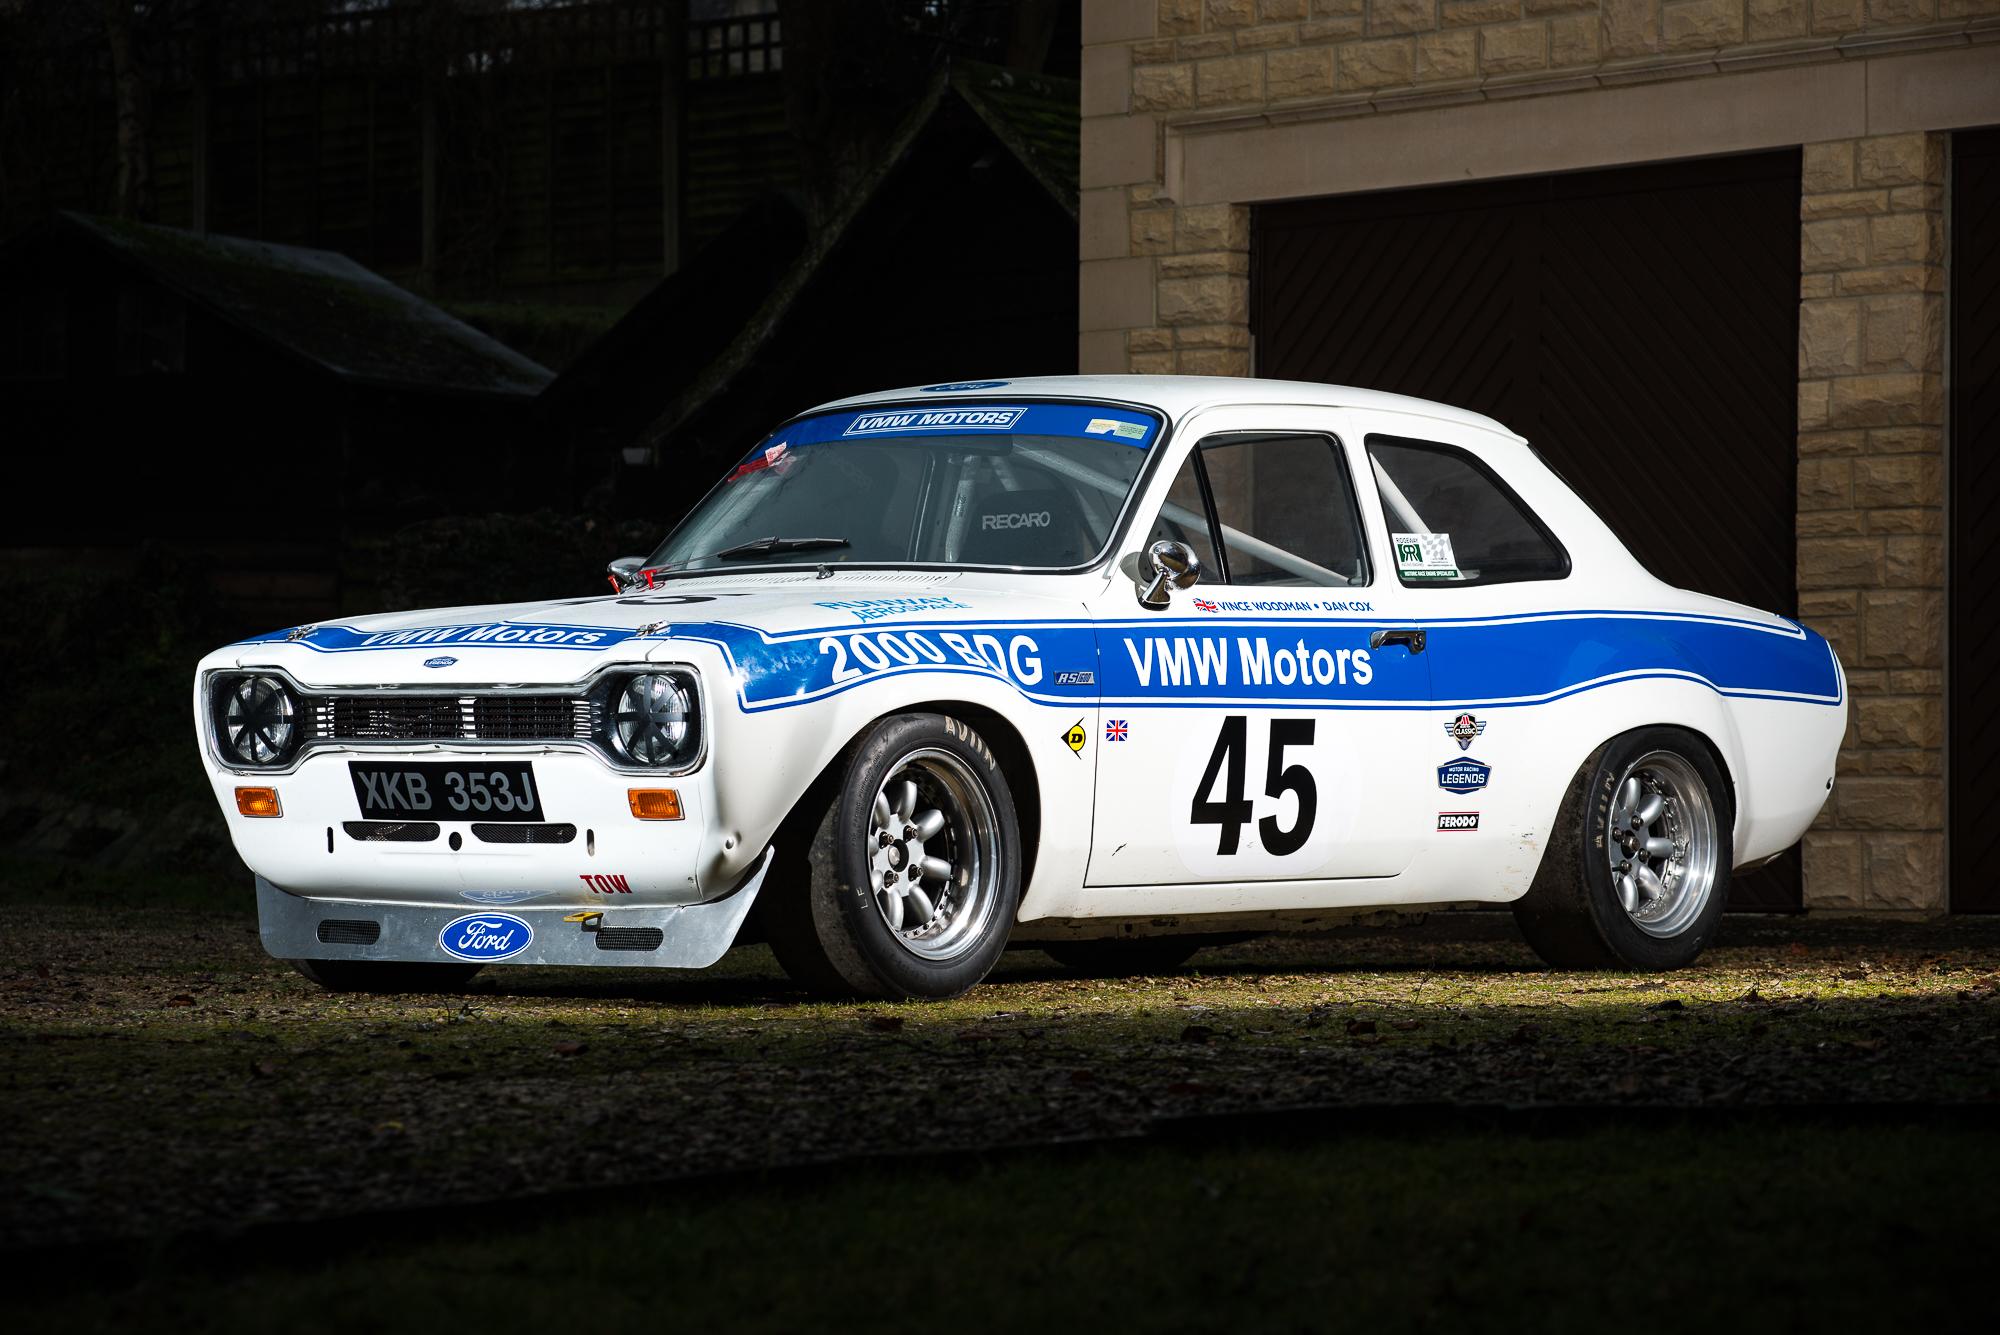 1970 Ford Escort Mki Rs1600 Fia Race Car Classic Driver Market Police